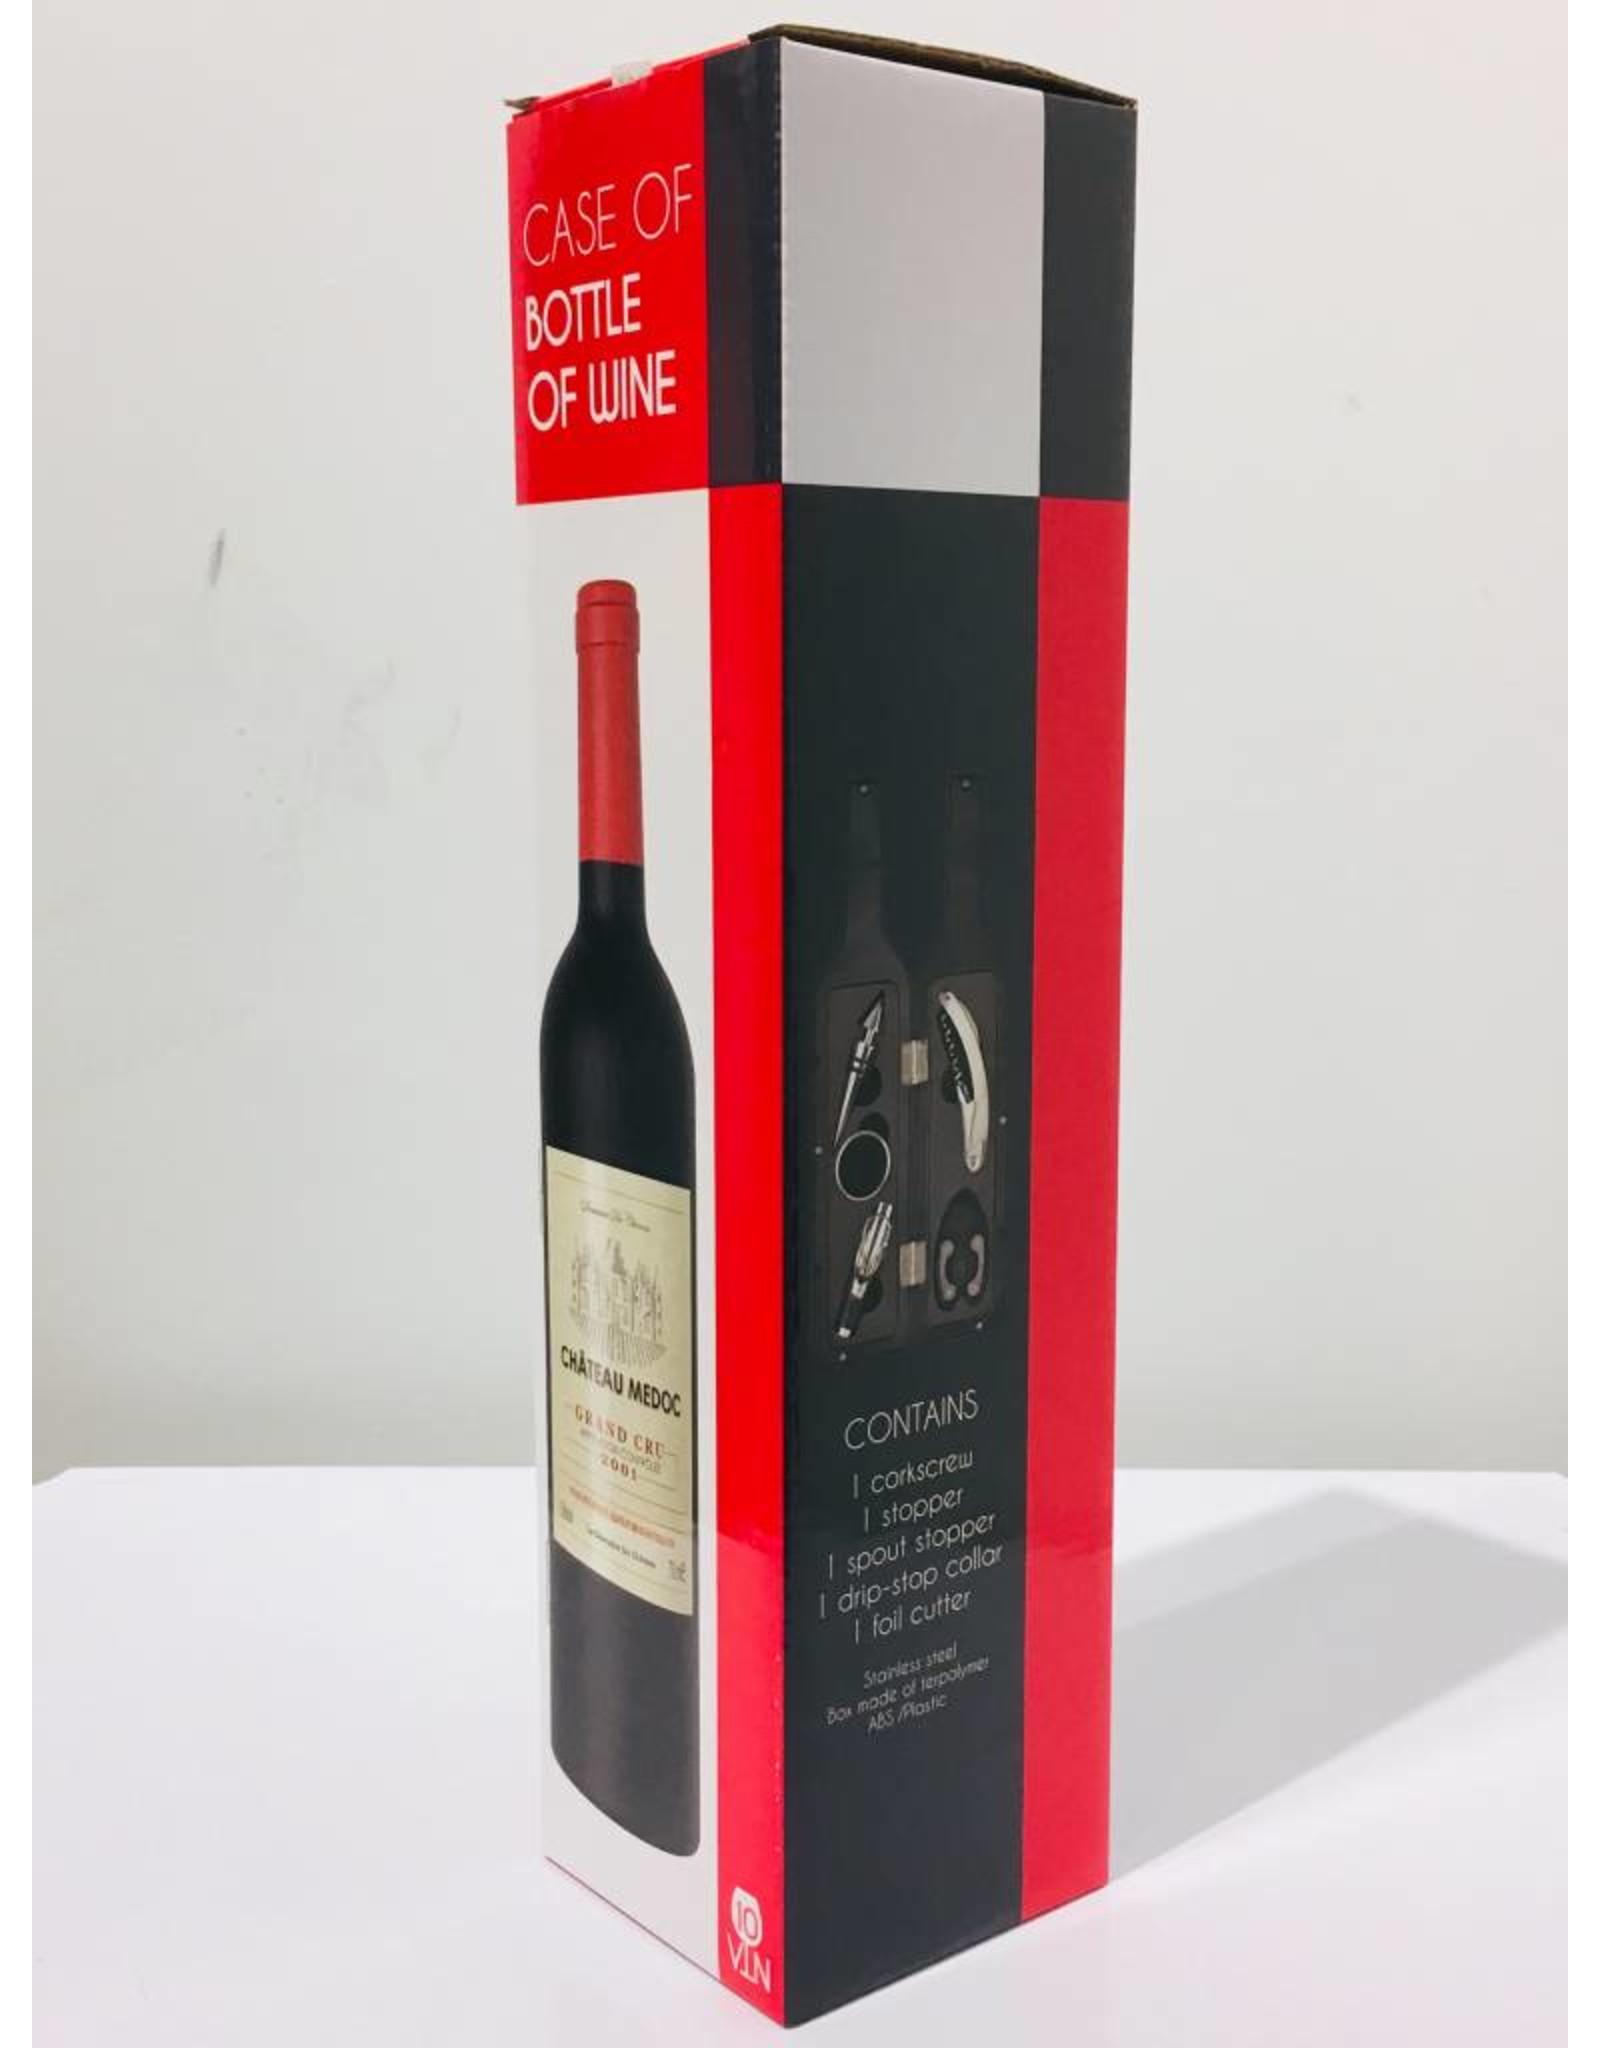 wine kit in the shape of a wine bottle (large)